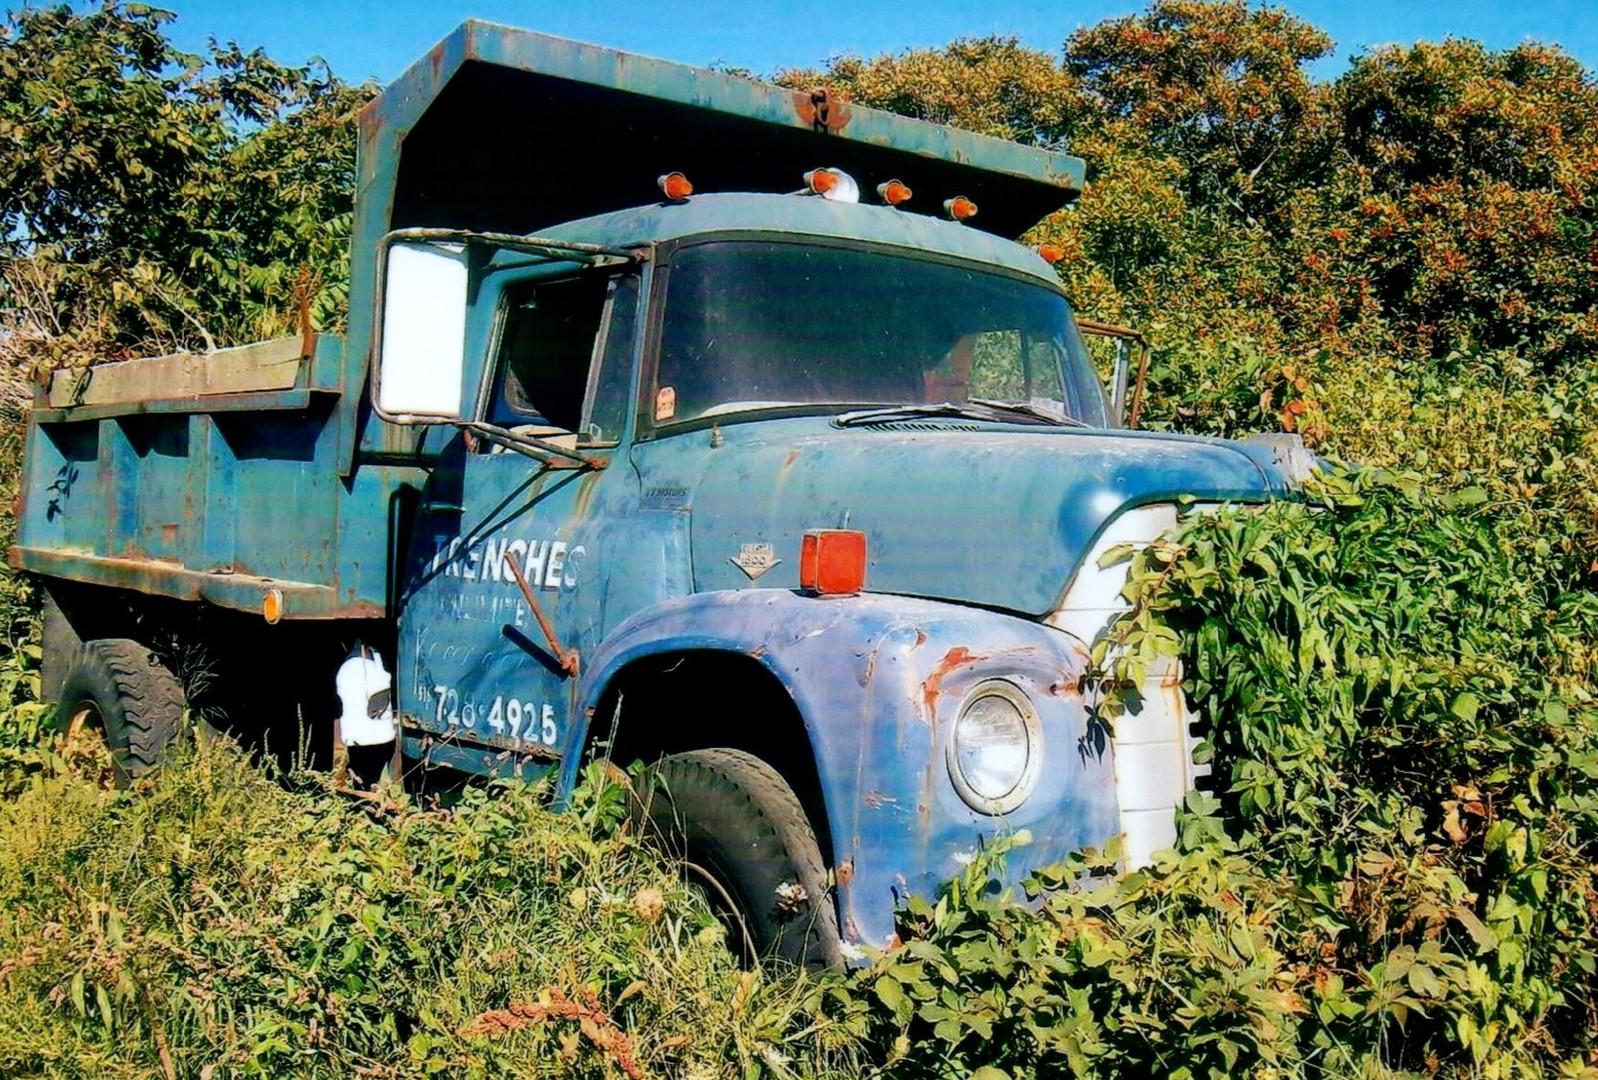 1962-71 International Loadstar hiding in the bushes